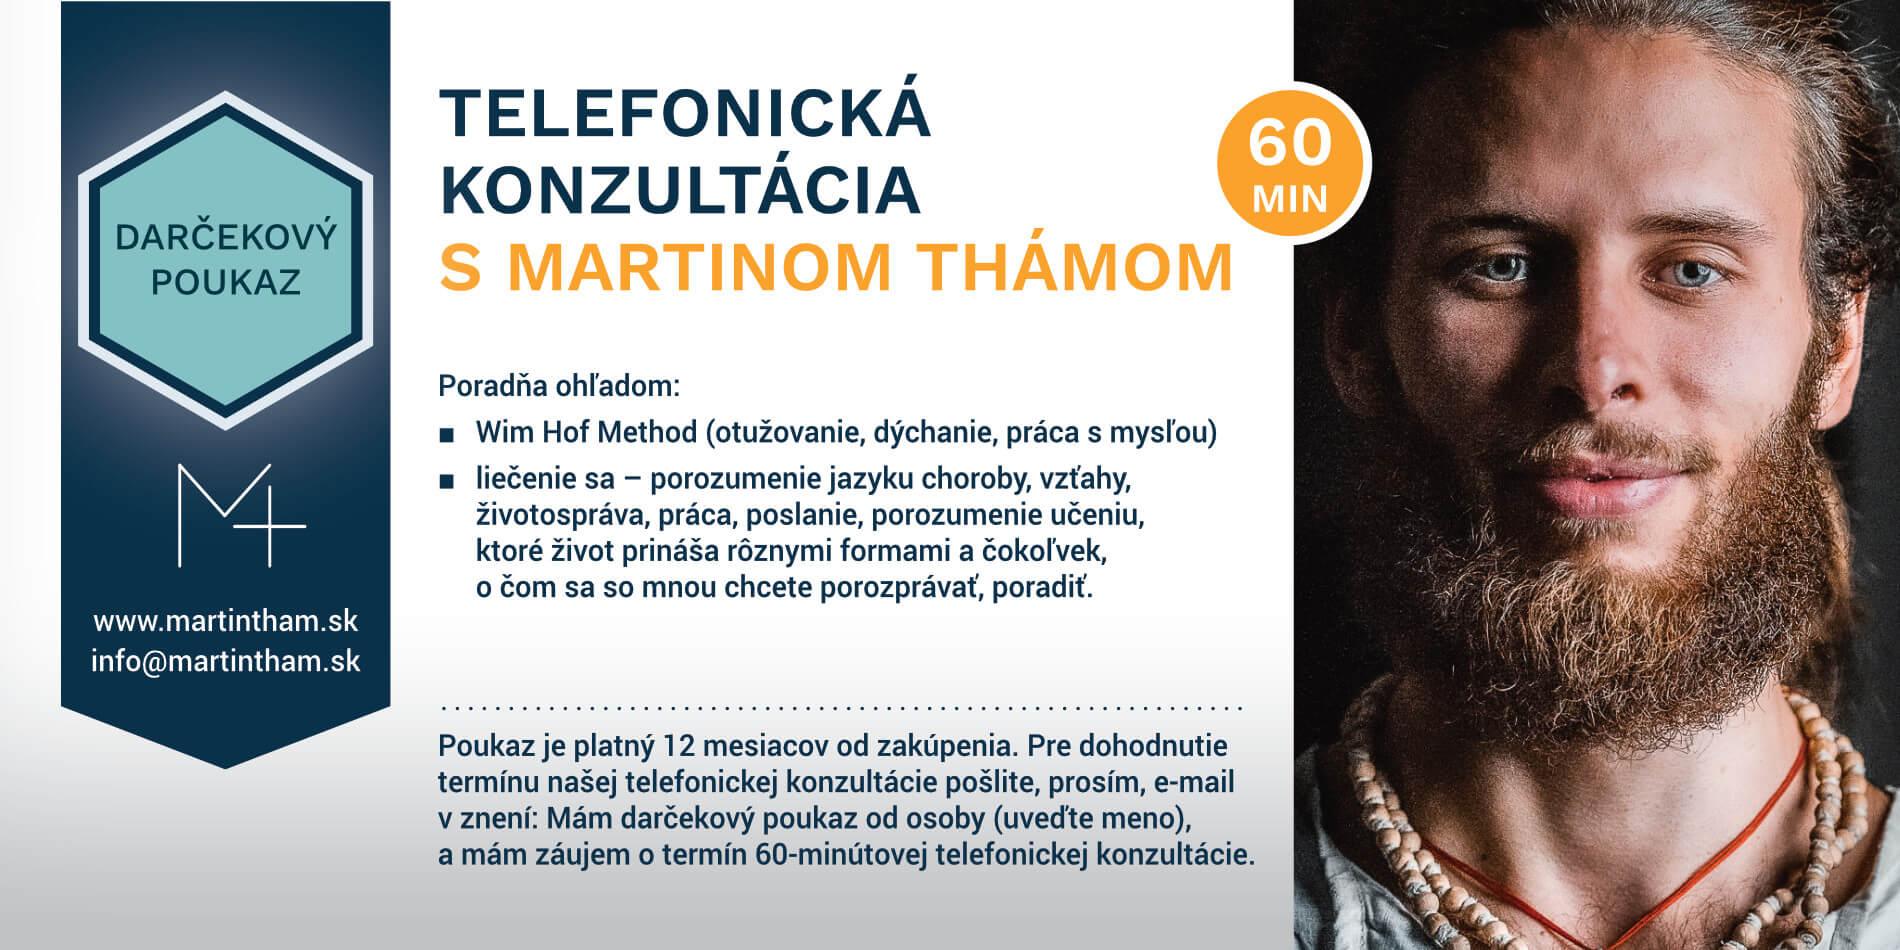 telefonicka-konzultacia-60